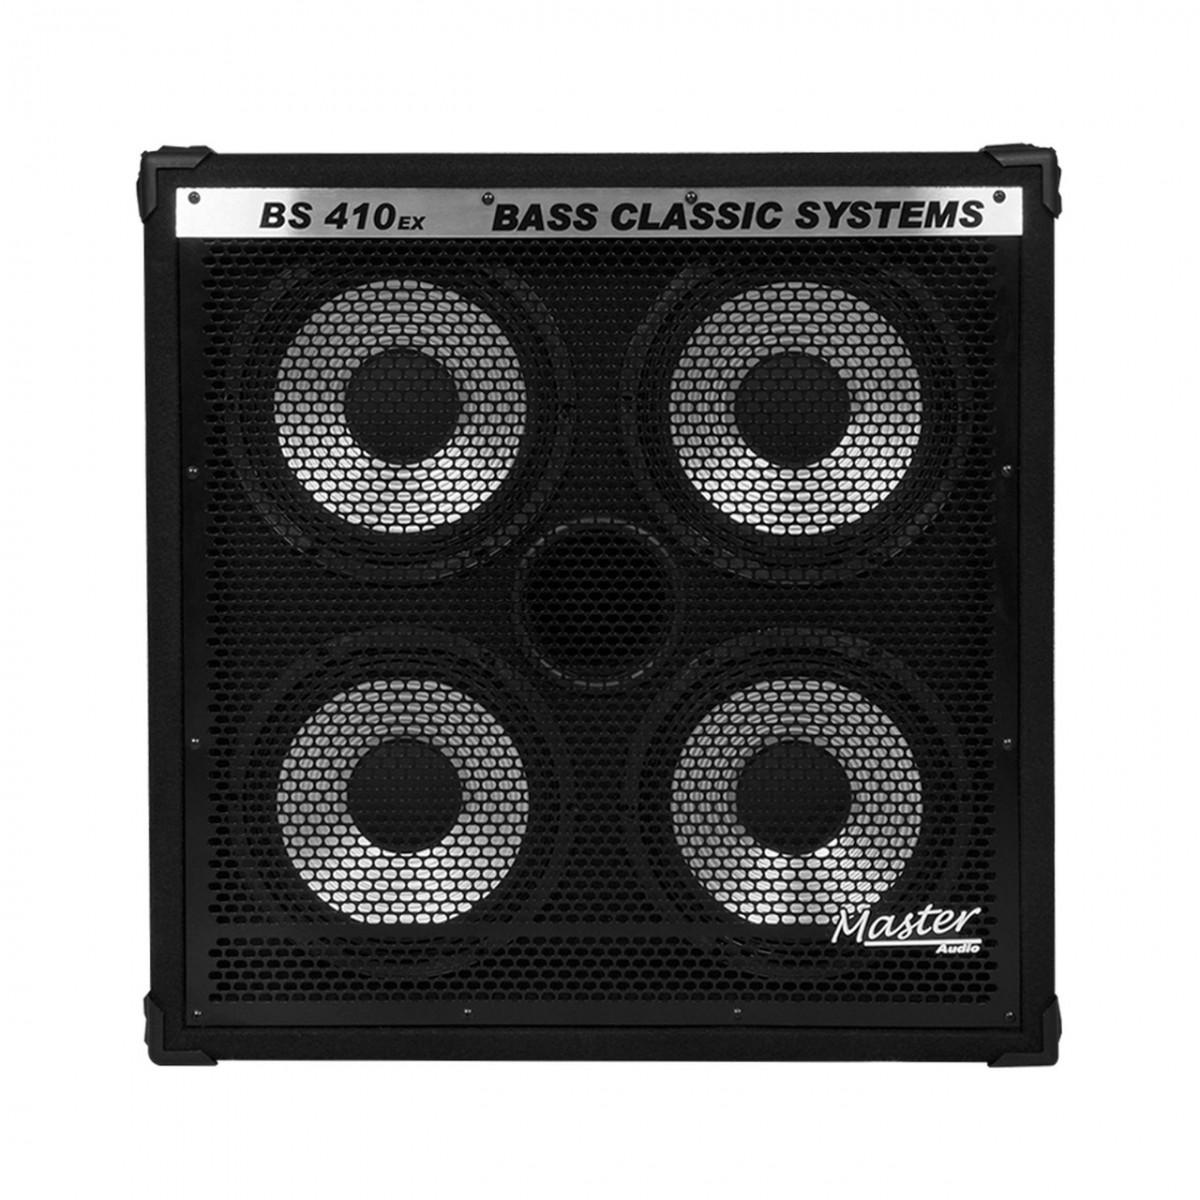 Caixa Master Áudio BS 410 EX Contra-Baixo